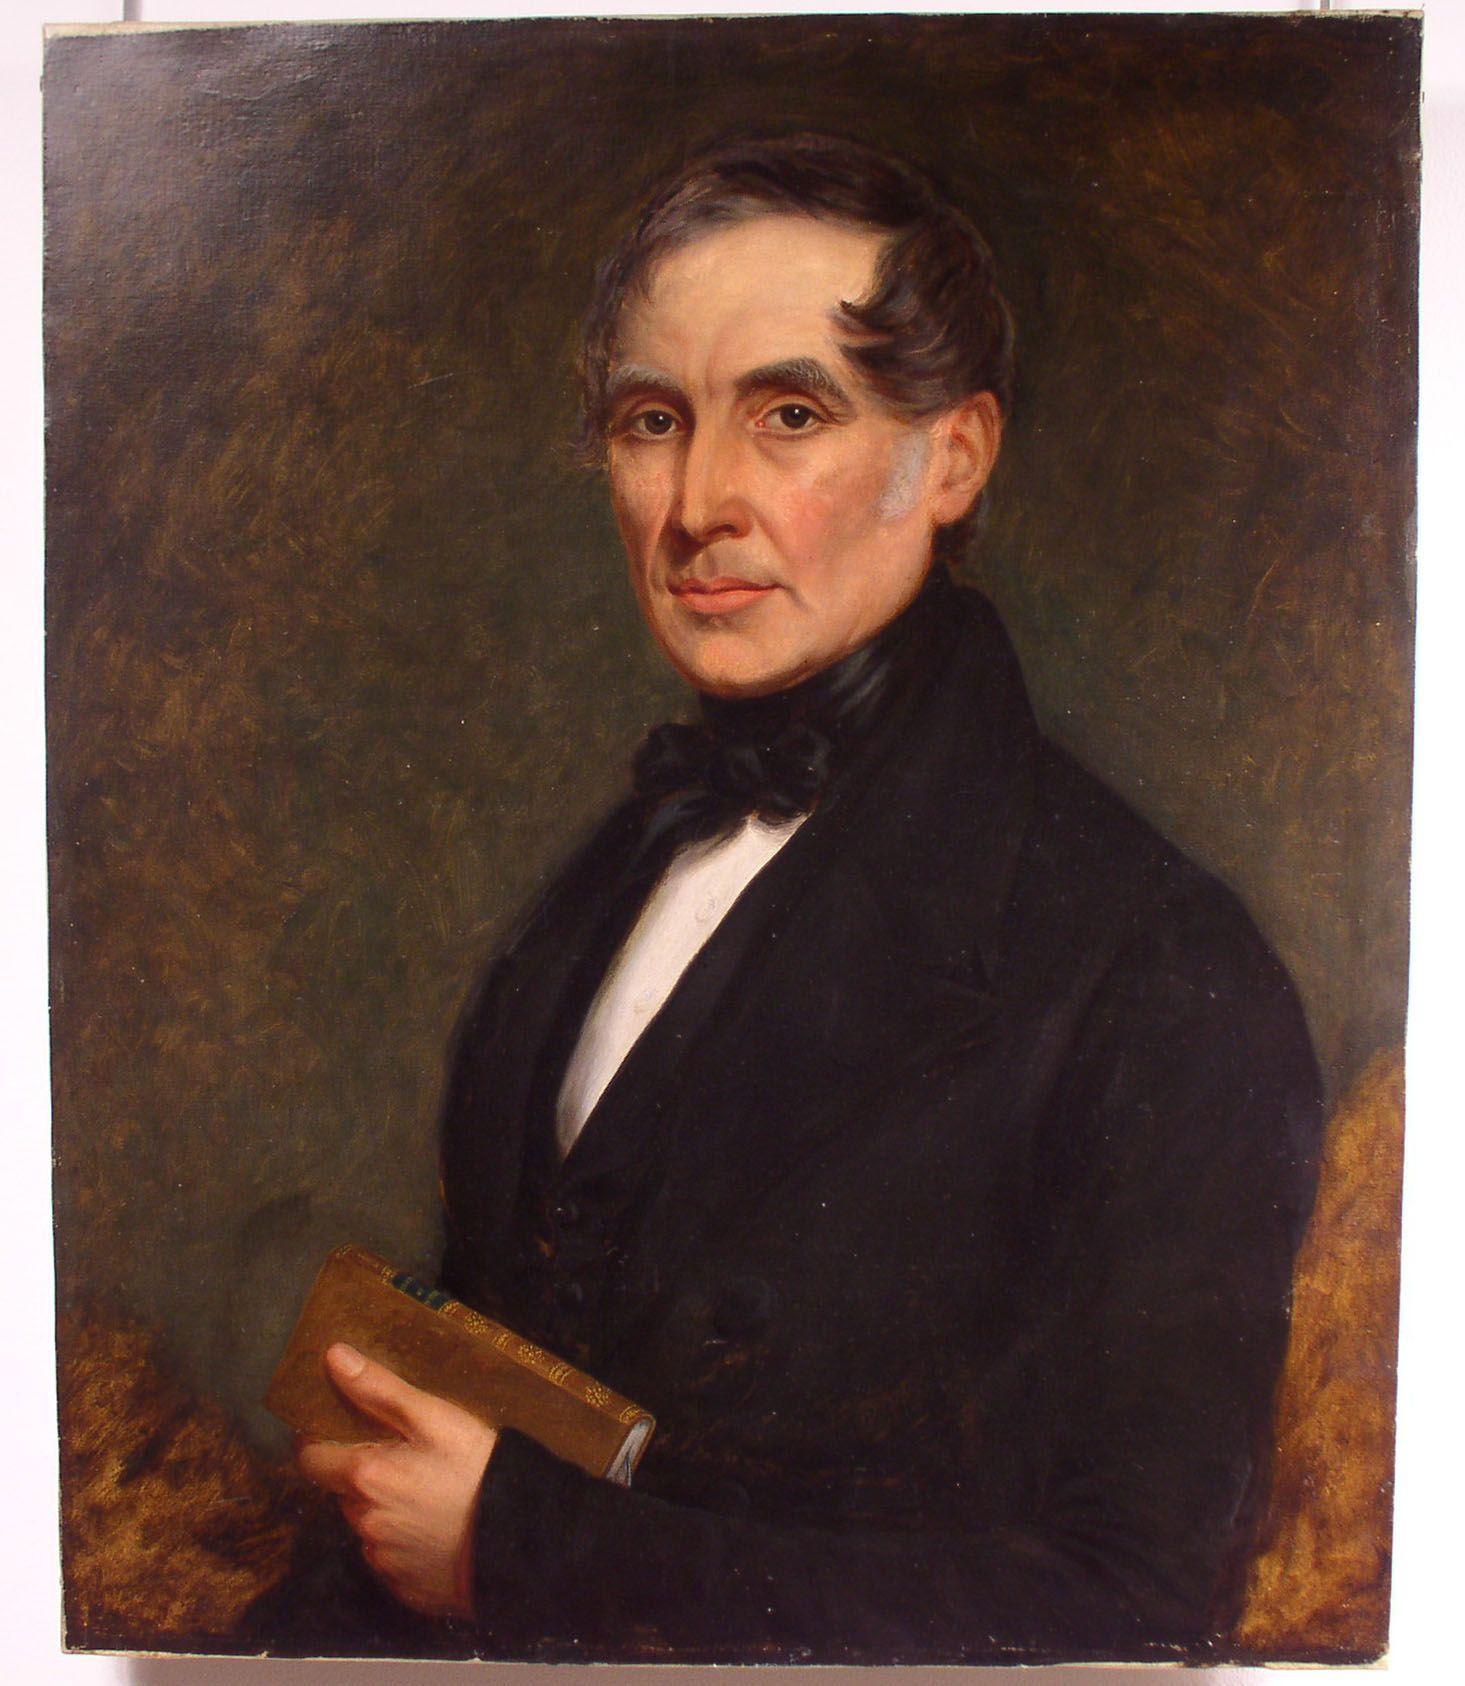 A portrait of Henry Heavisides